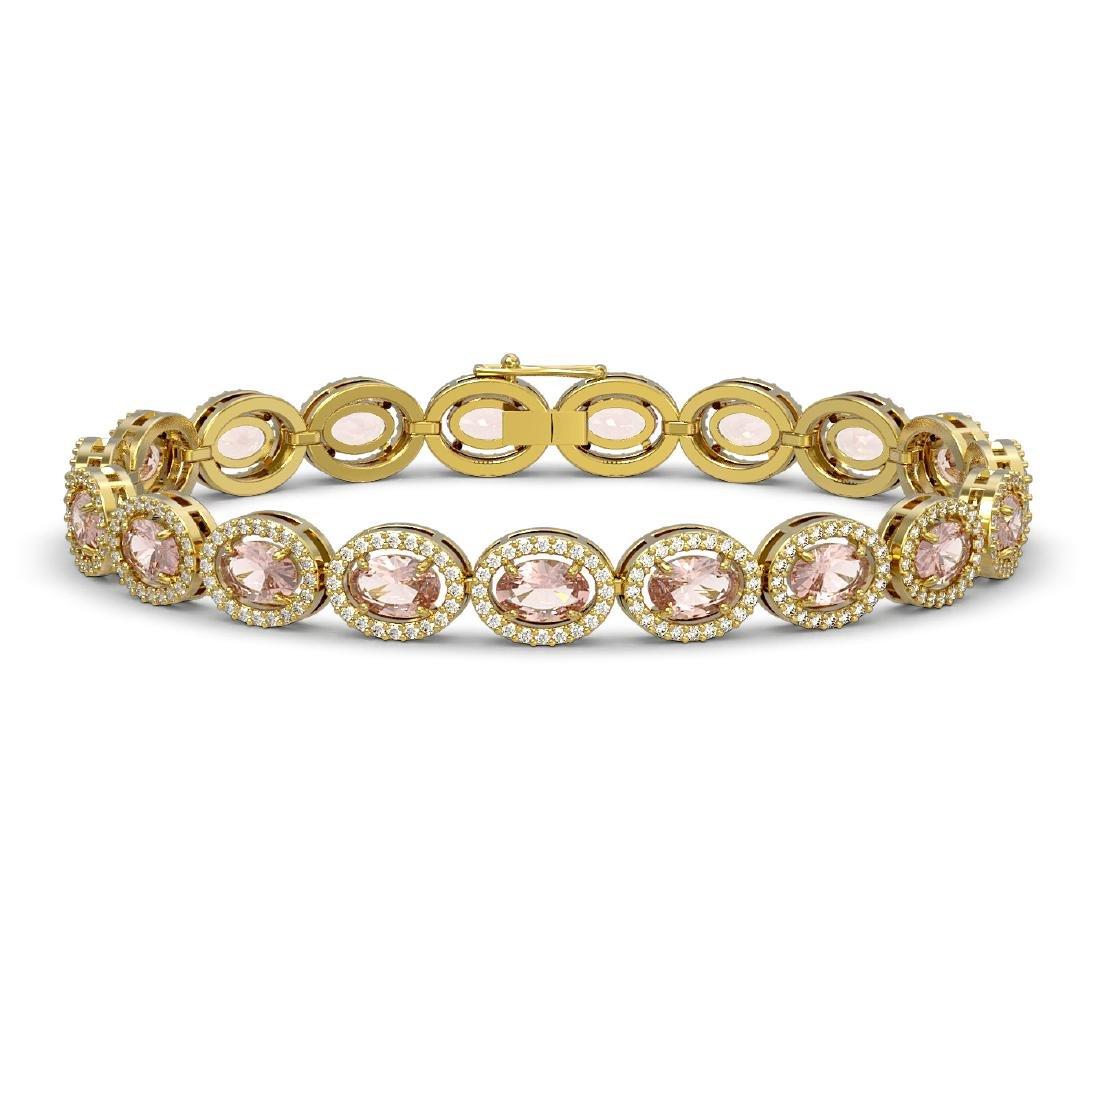 14.25 CTW Morganite & Diamond Halo Bracelet 10K Yellow